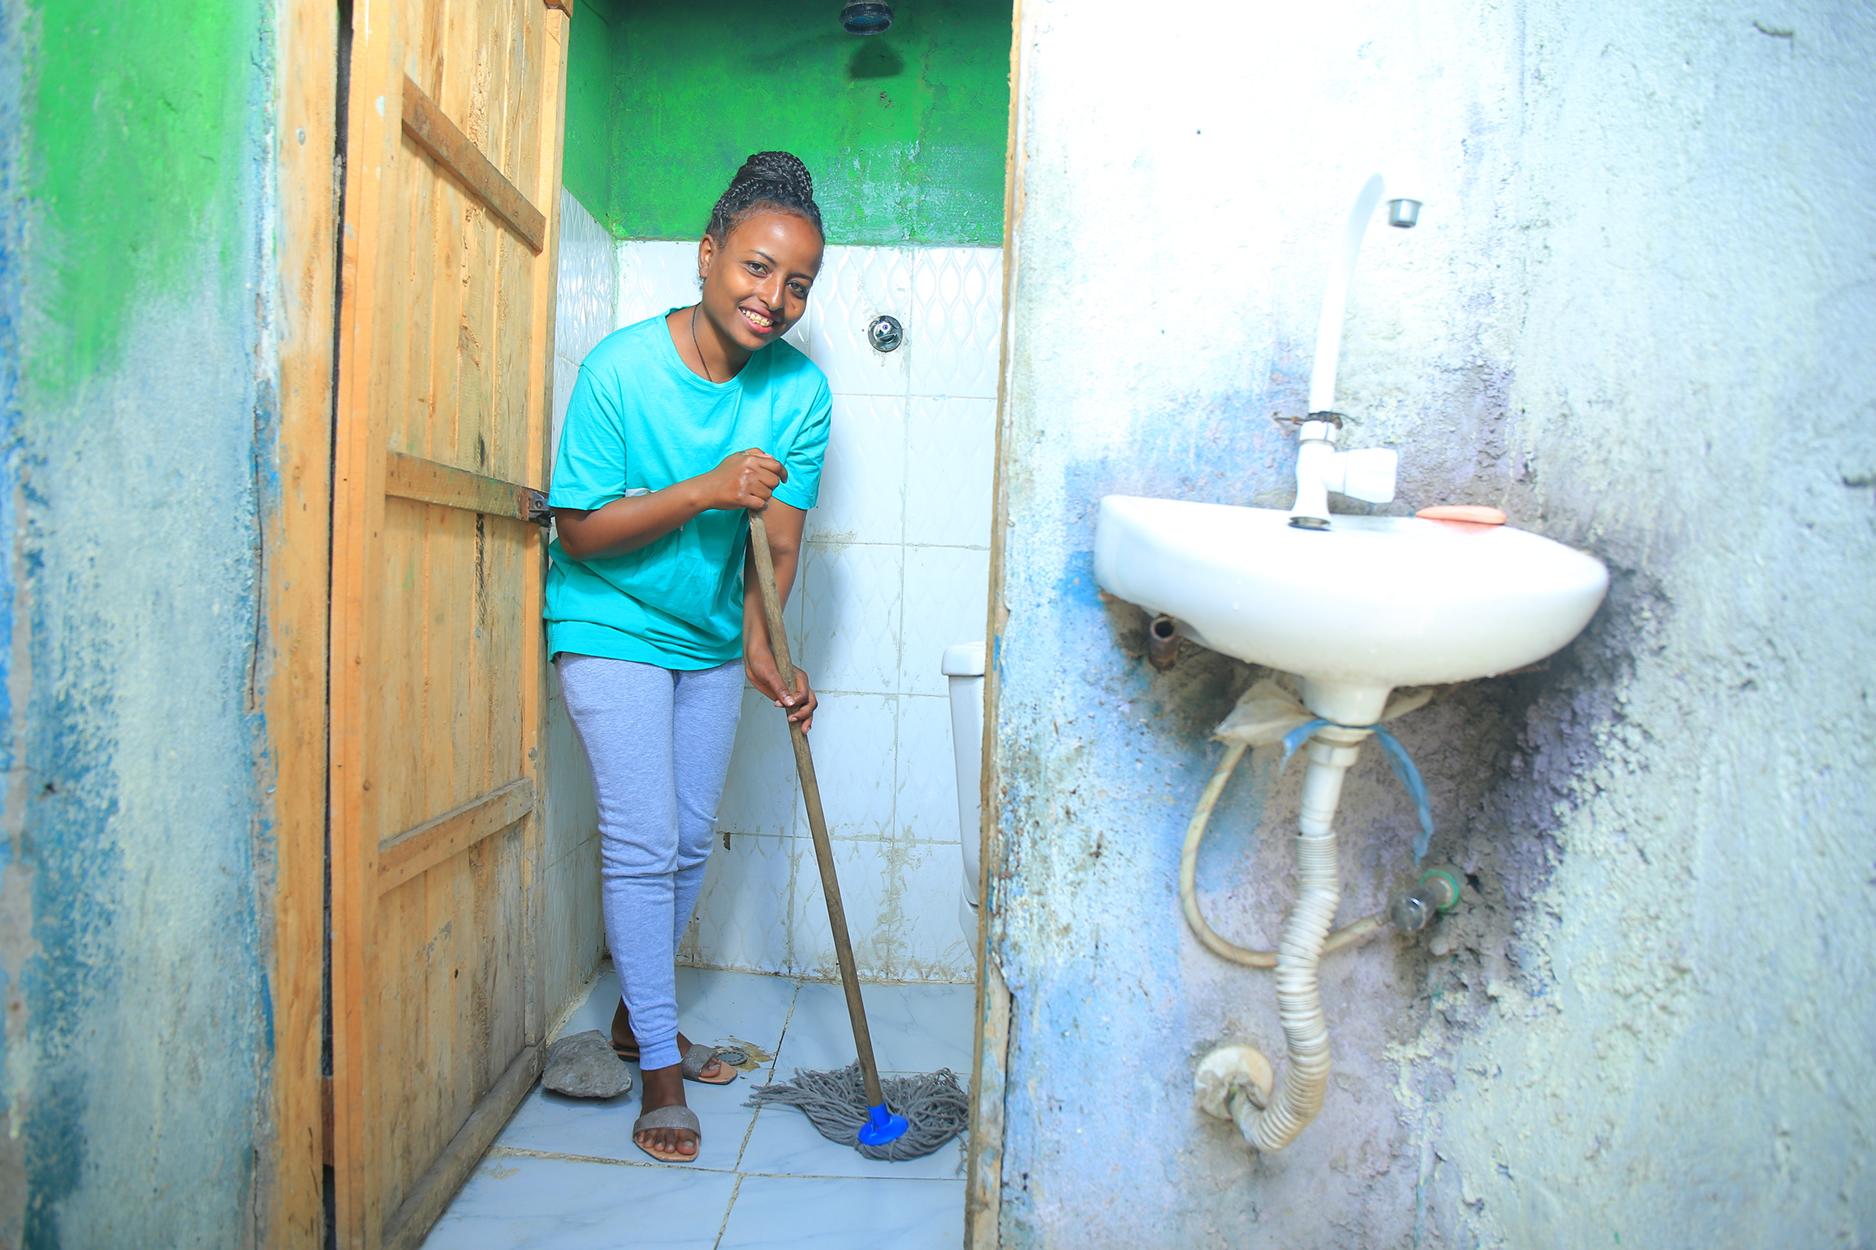 Urban WASH - Amref Ethiopia